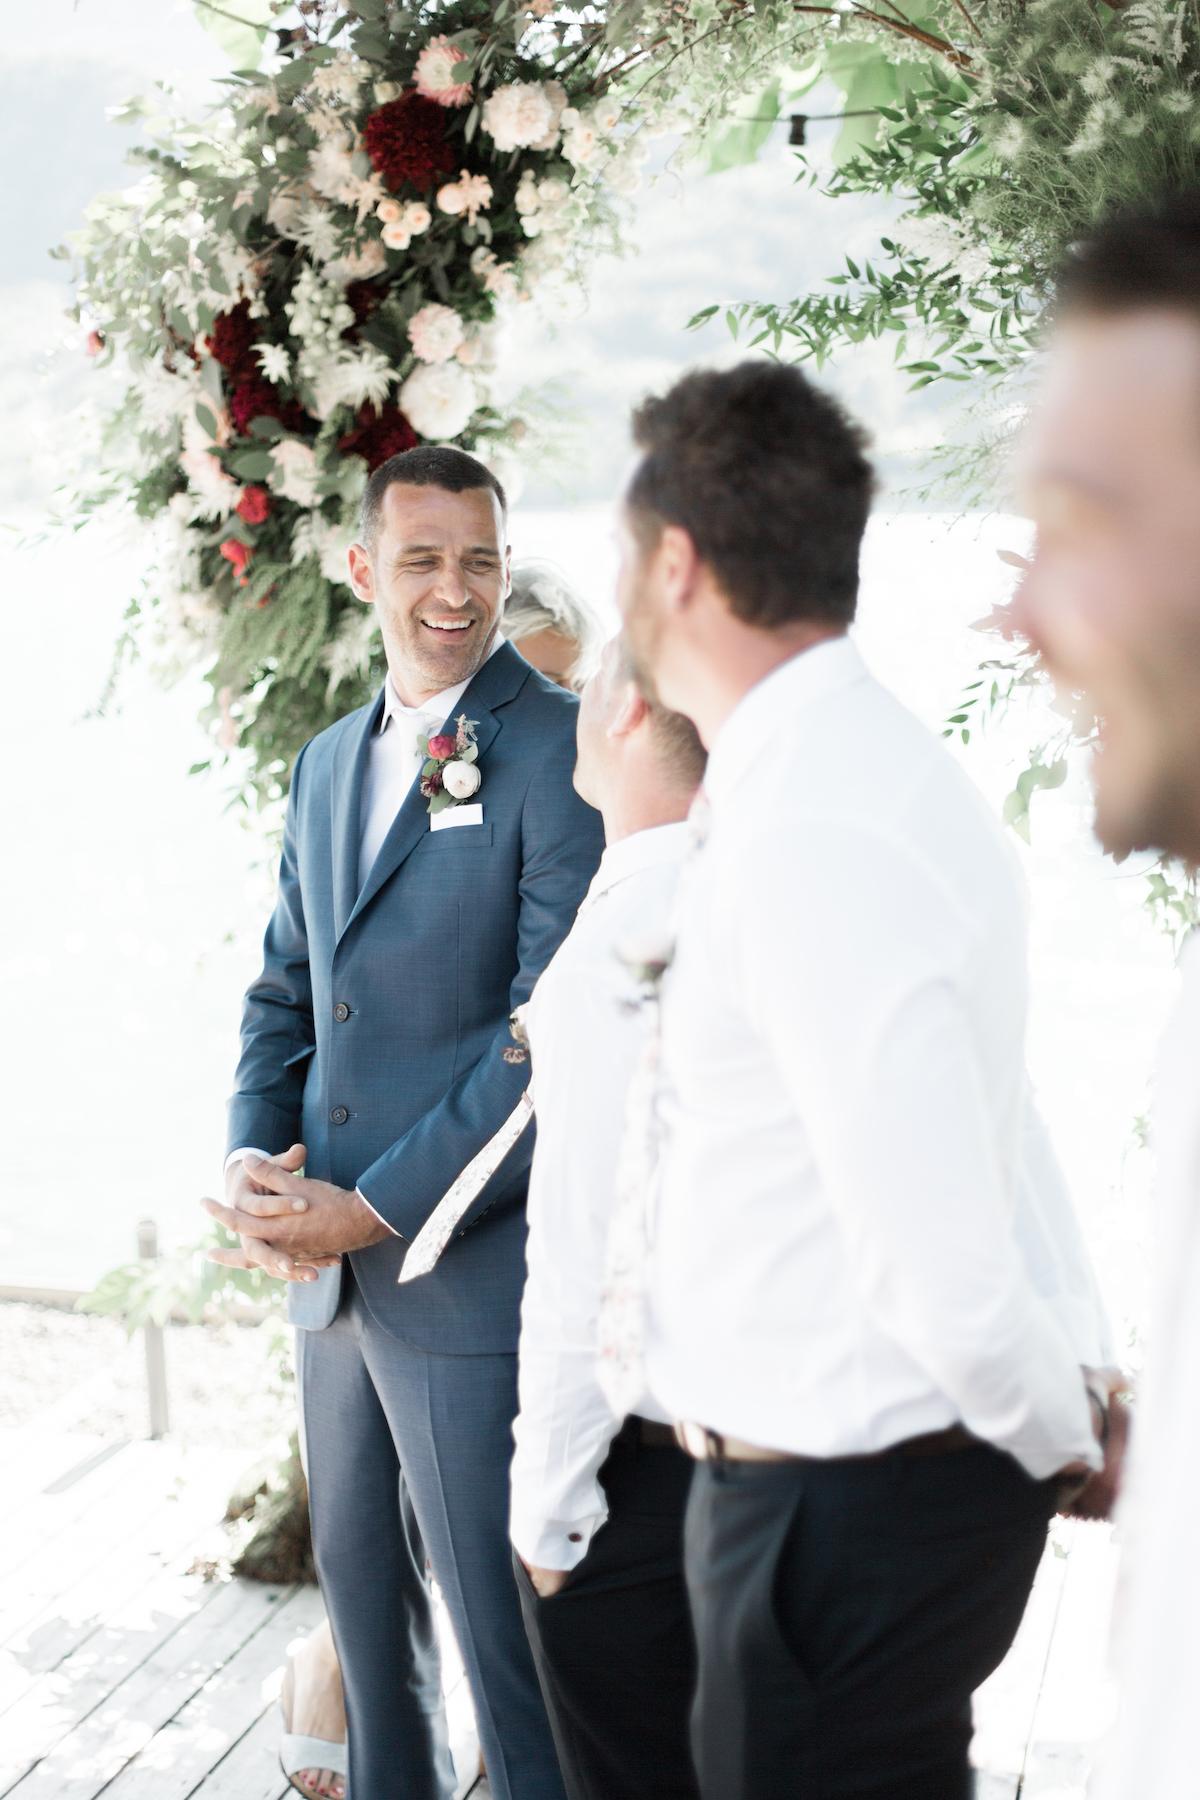 annecy-wedding-photos-93.jpg